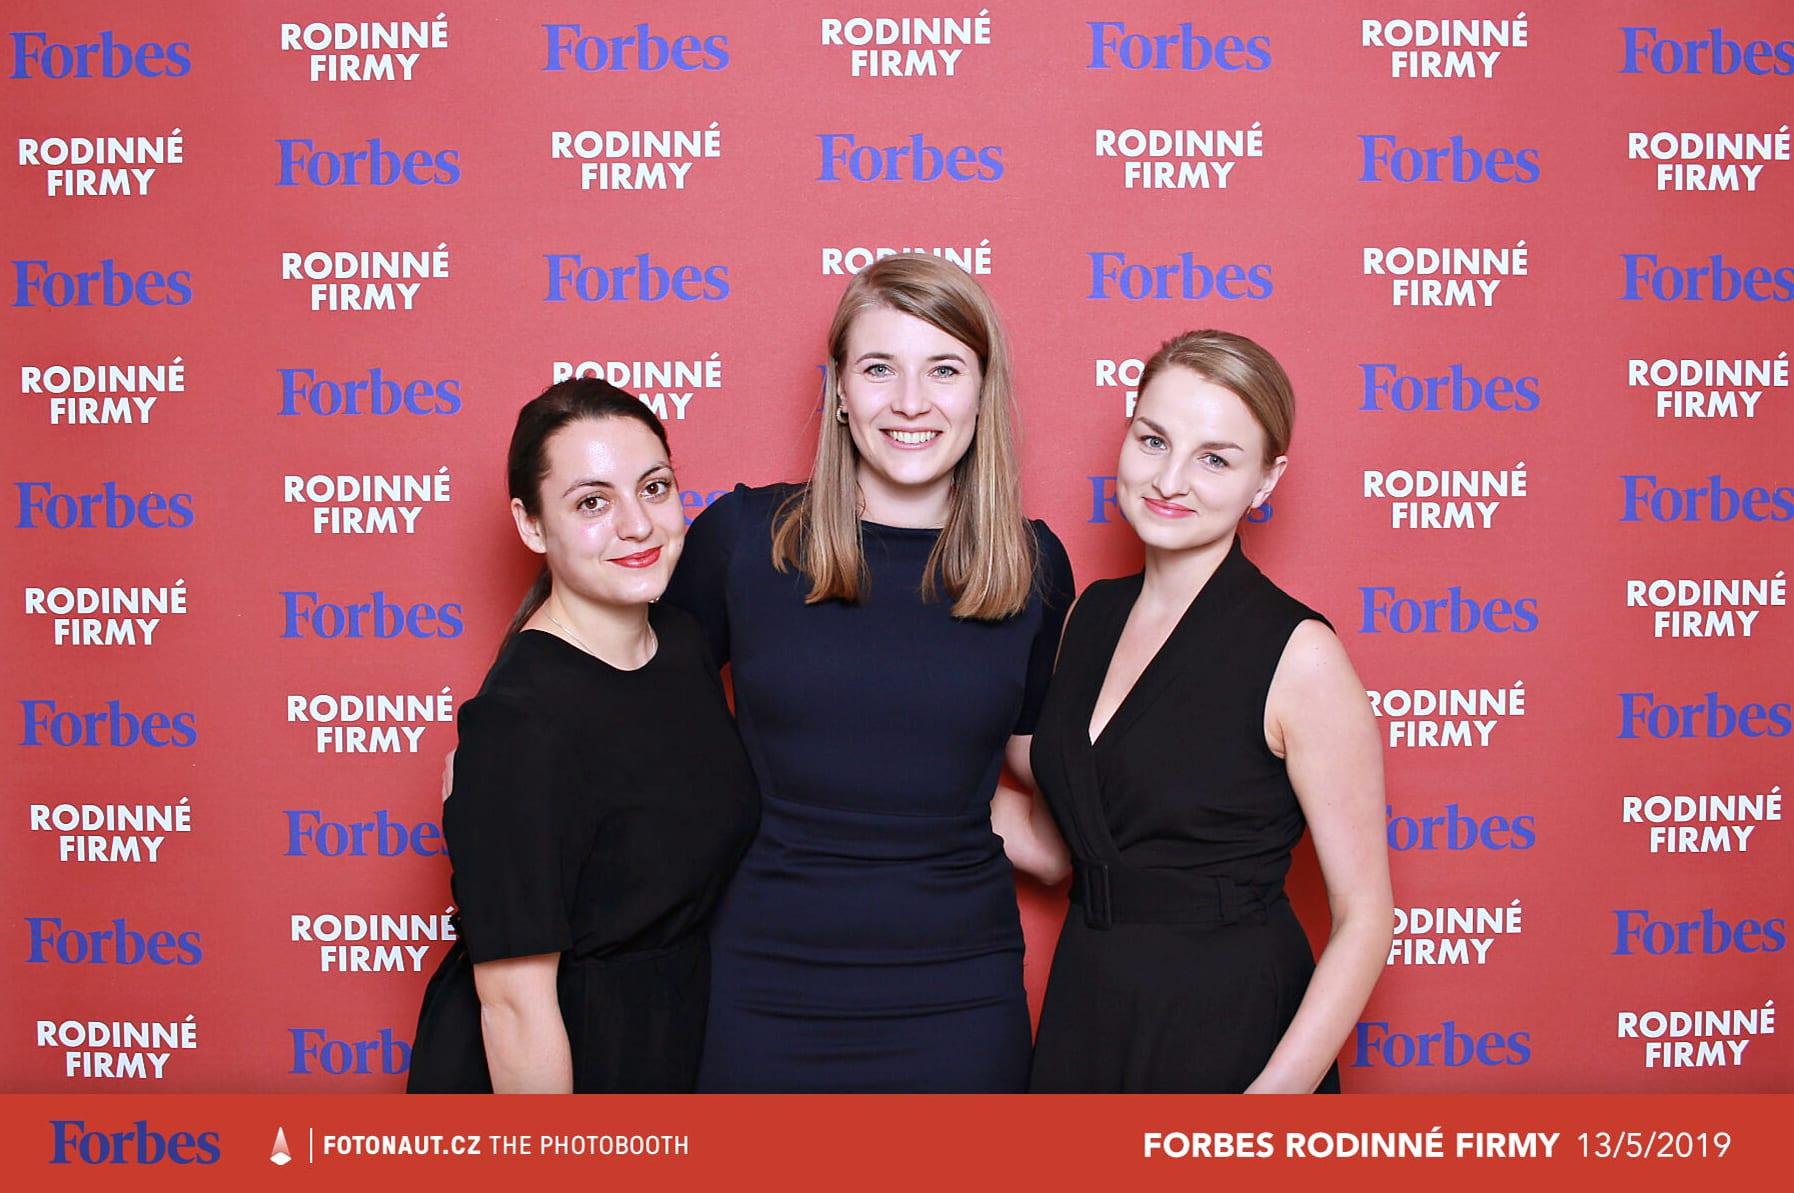 fotokoutek-forbes-rodinne-firmy-13-5-2019-605961